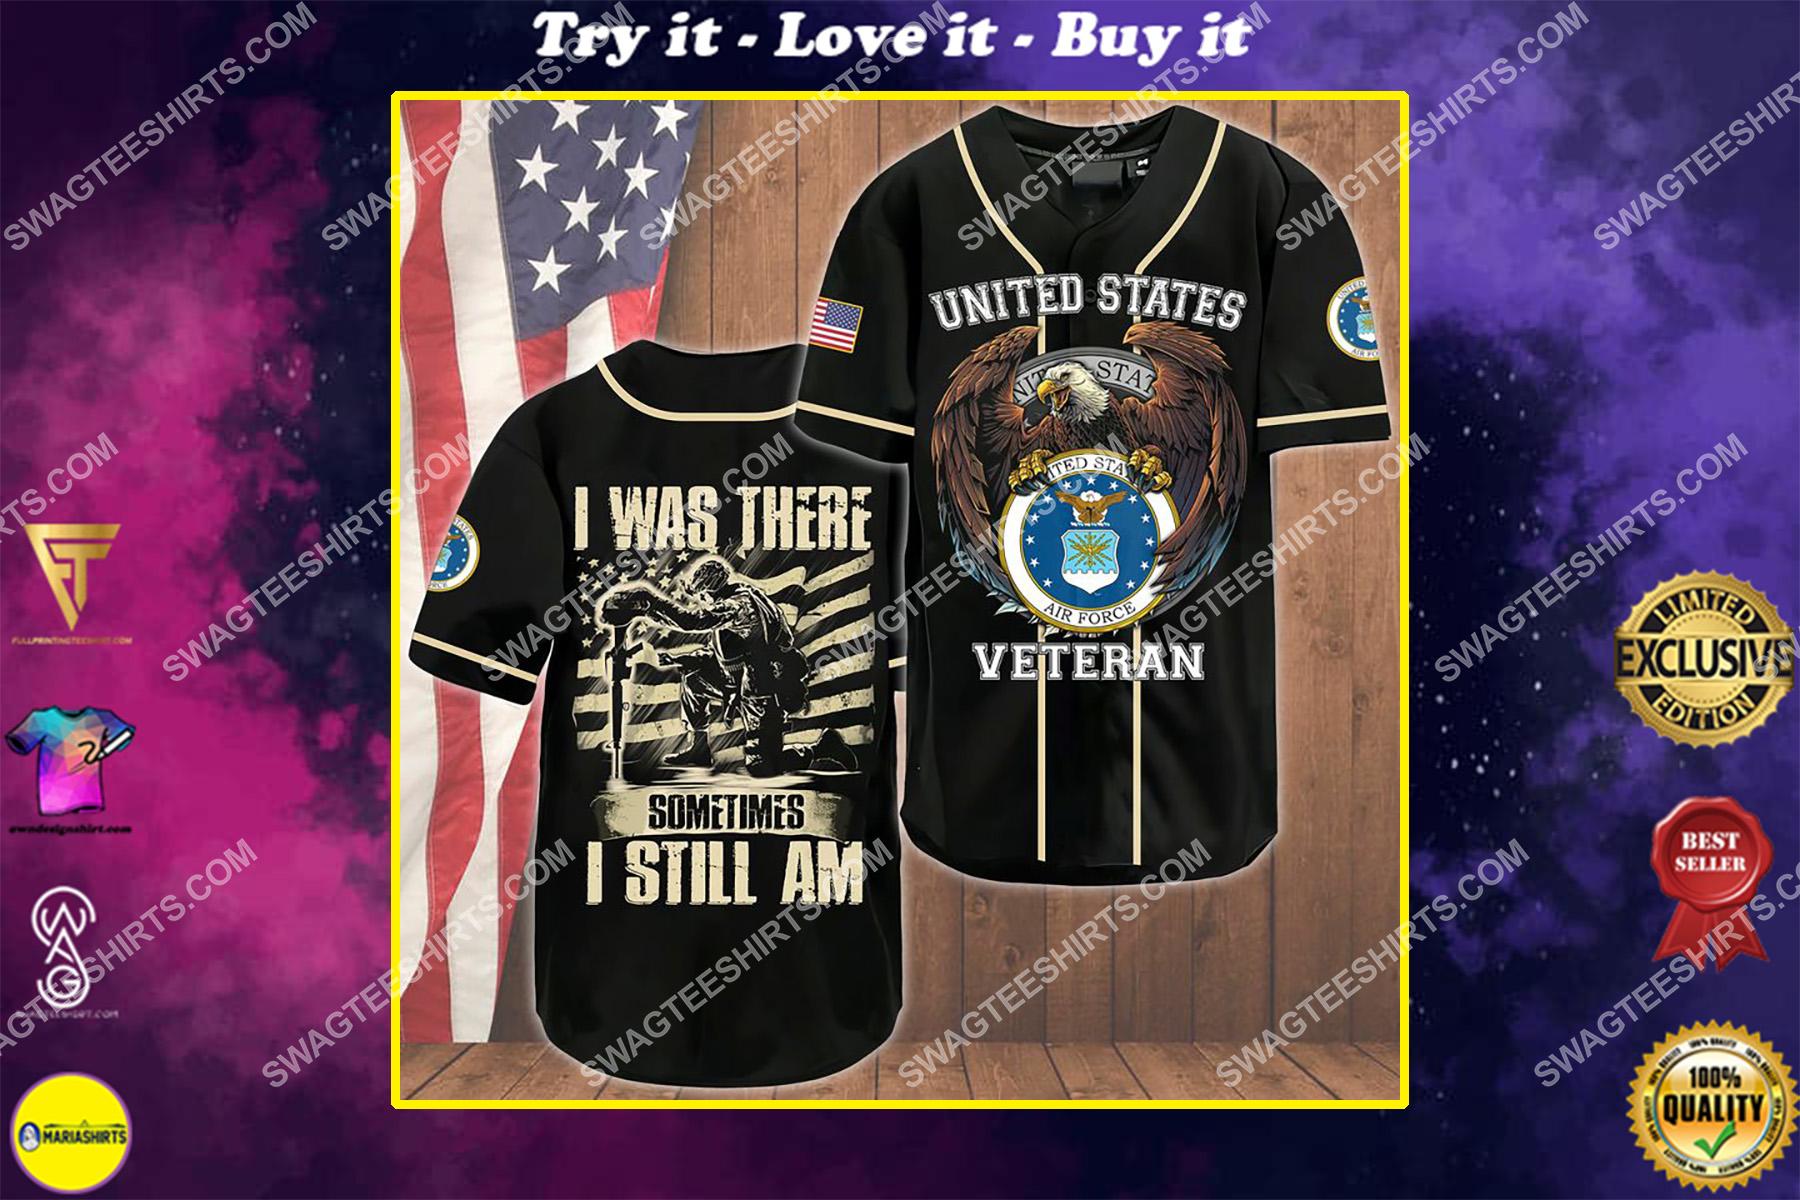 i was there sometimes i still am air force veteran baseball shirt